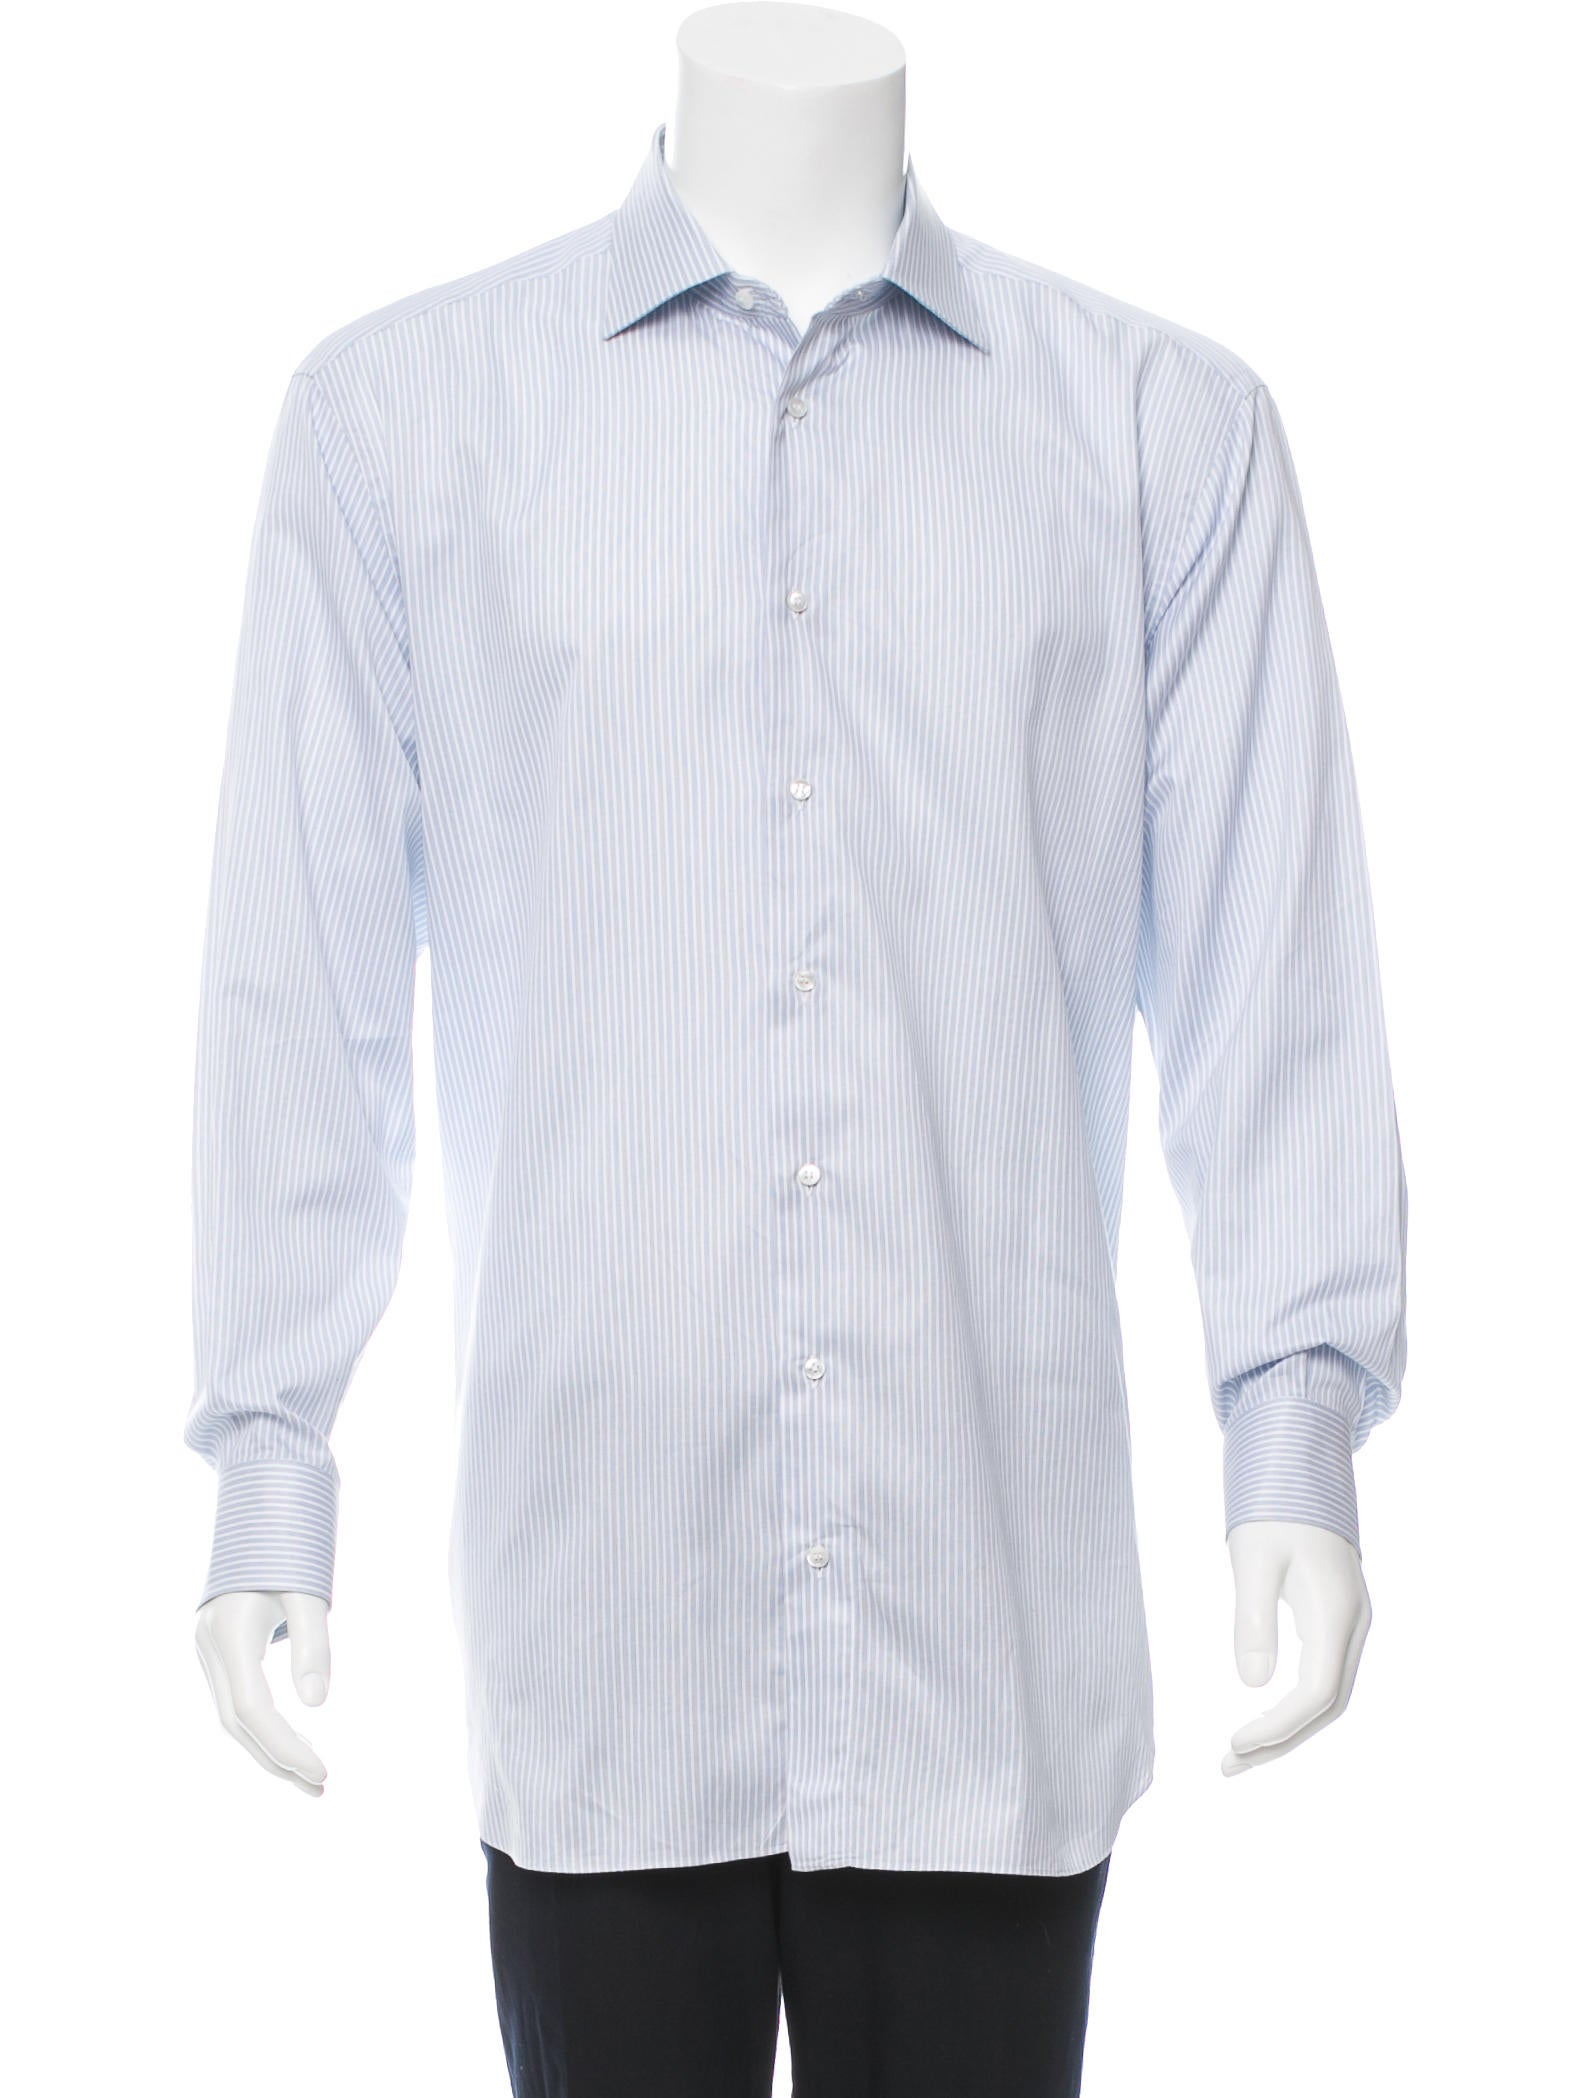 Brioni striped button up shirt clothing bro21662 the for Striped button up shirt mens